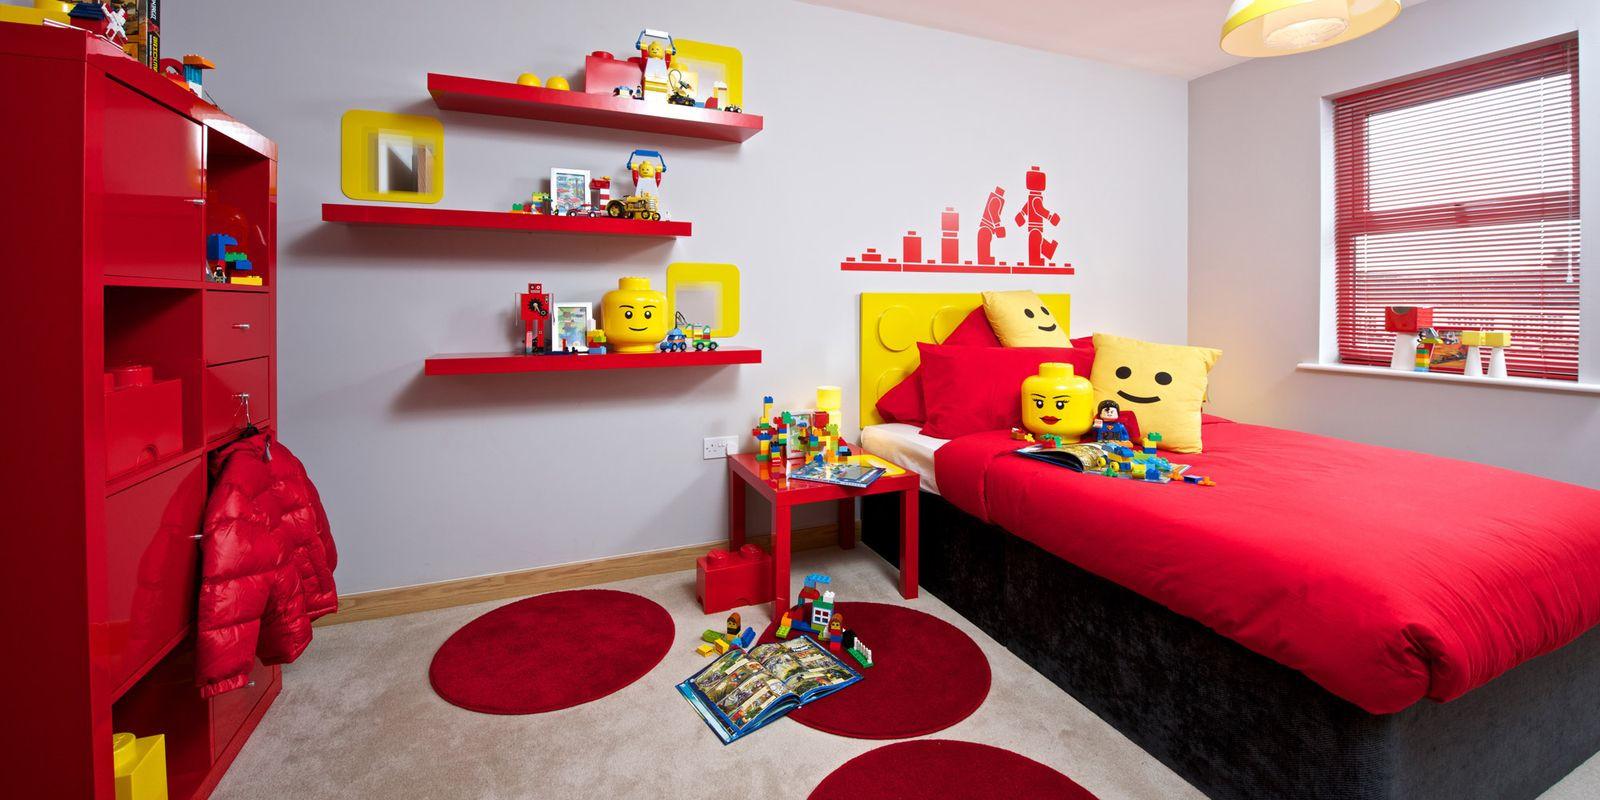 Lego Kids Room  LEGO Kids Bedroom Weston Homes Lego Room